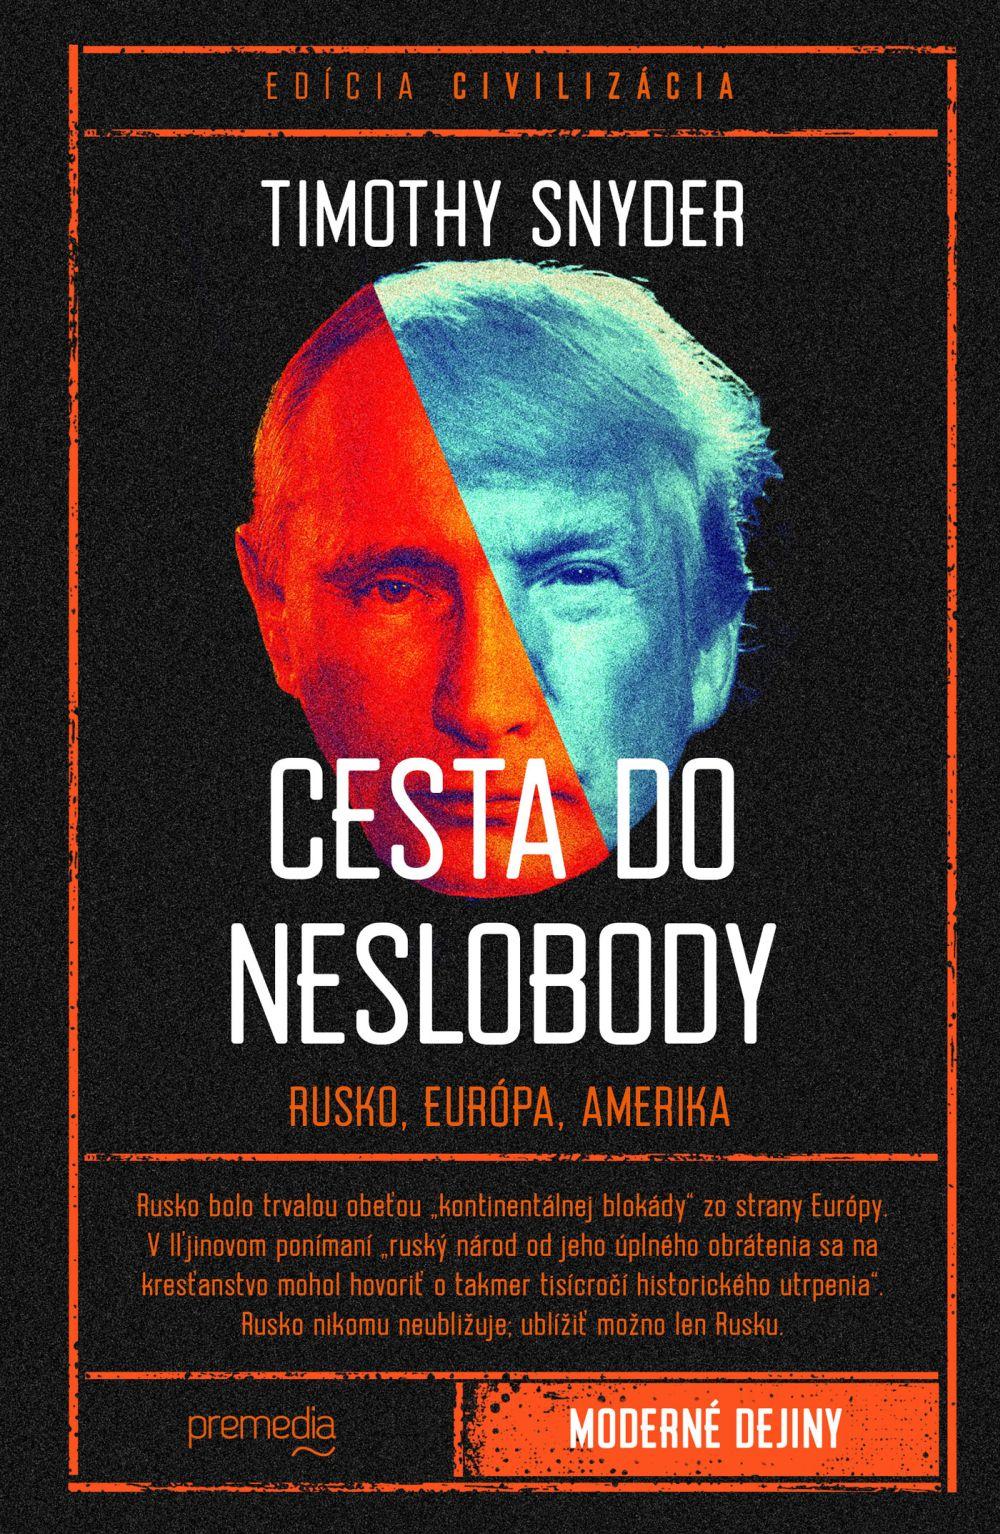 Cesta do neslobody - Rusko, Európa, Amerika